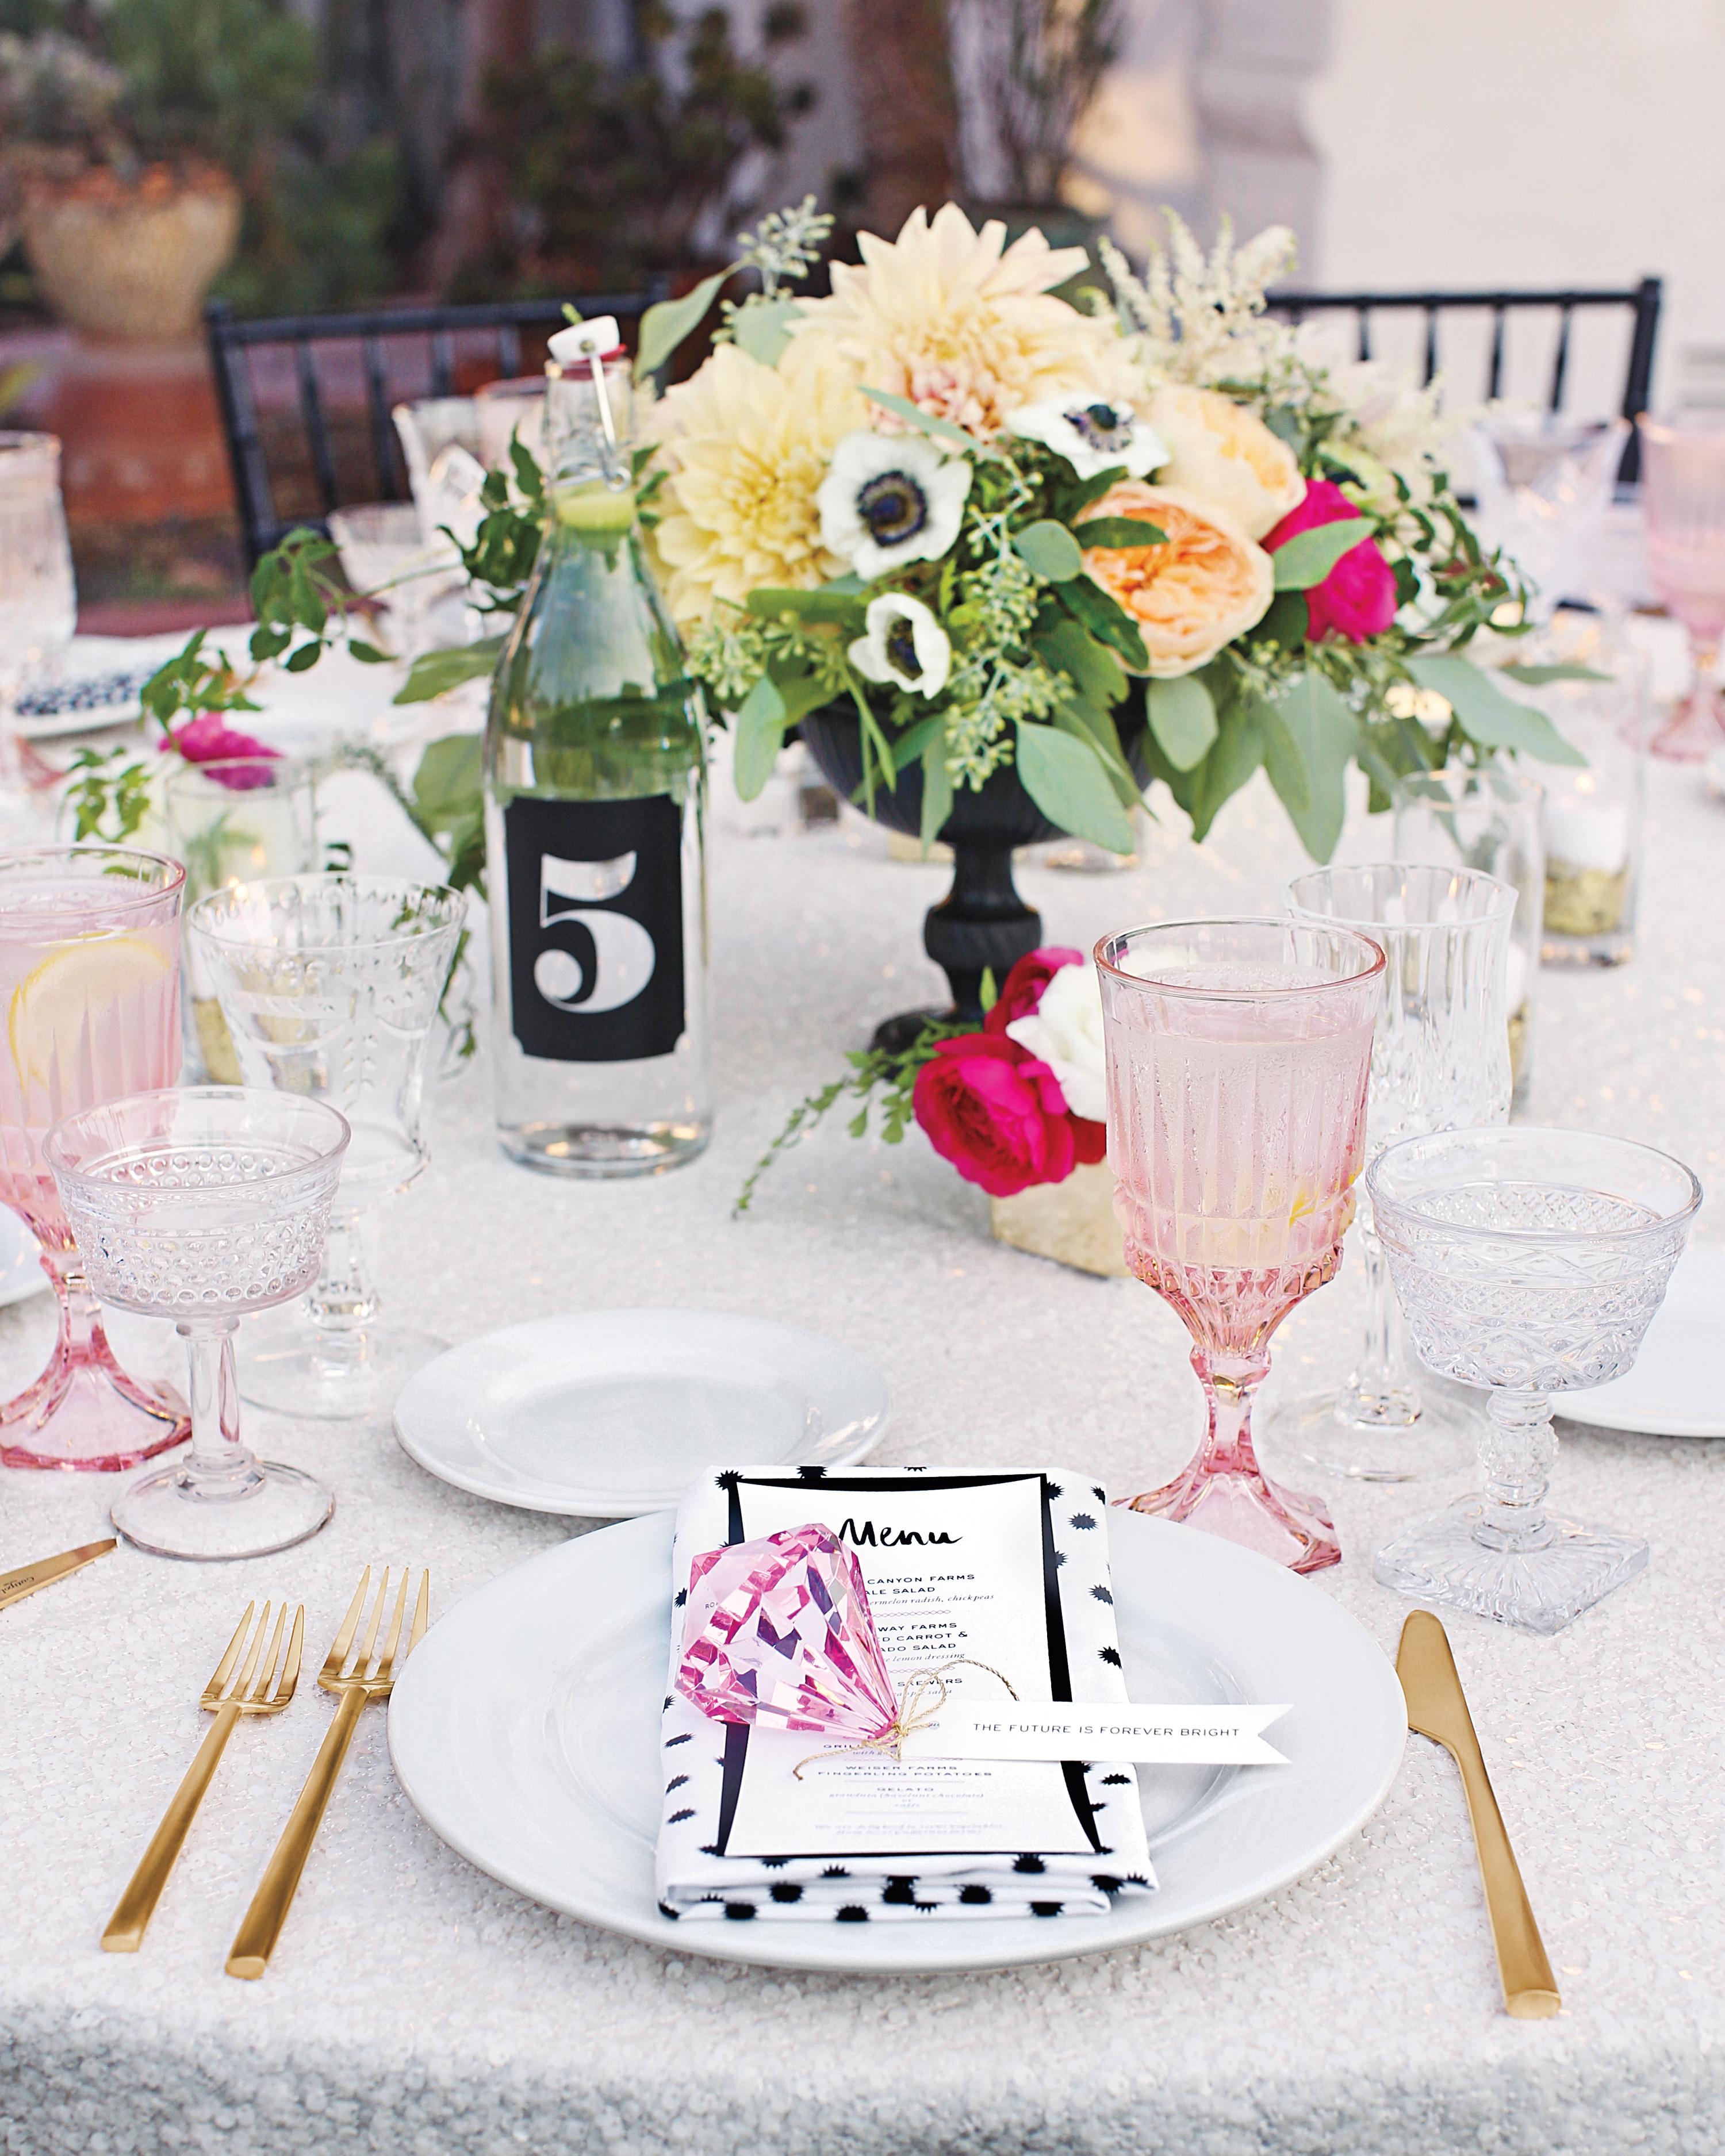 table-setting-002-mwd109359.jpg